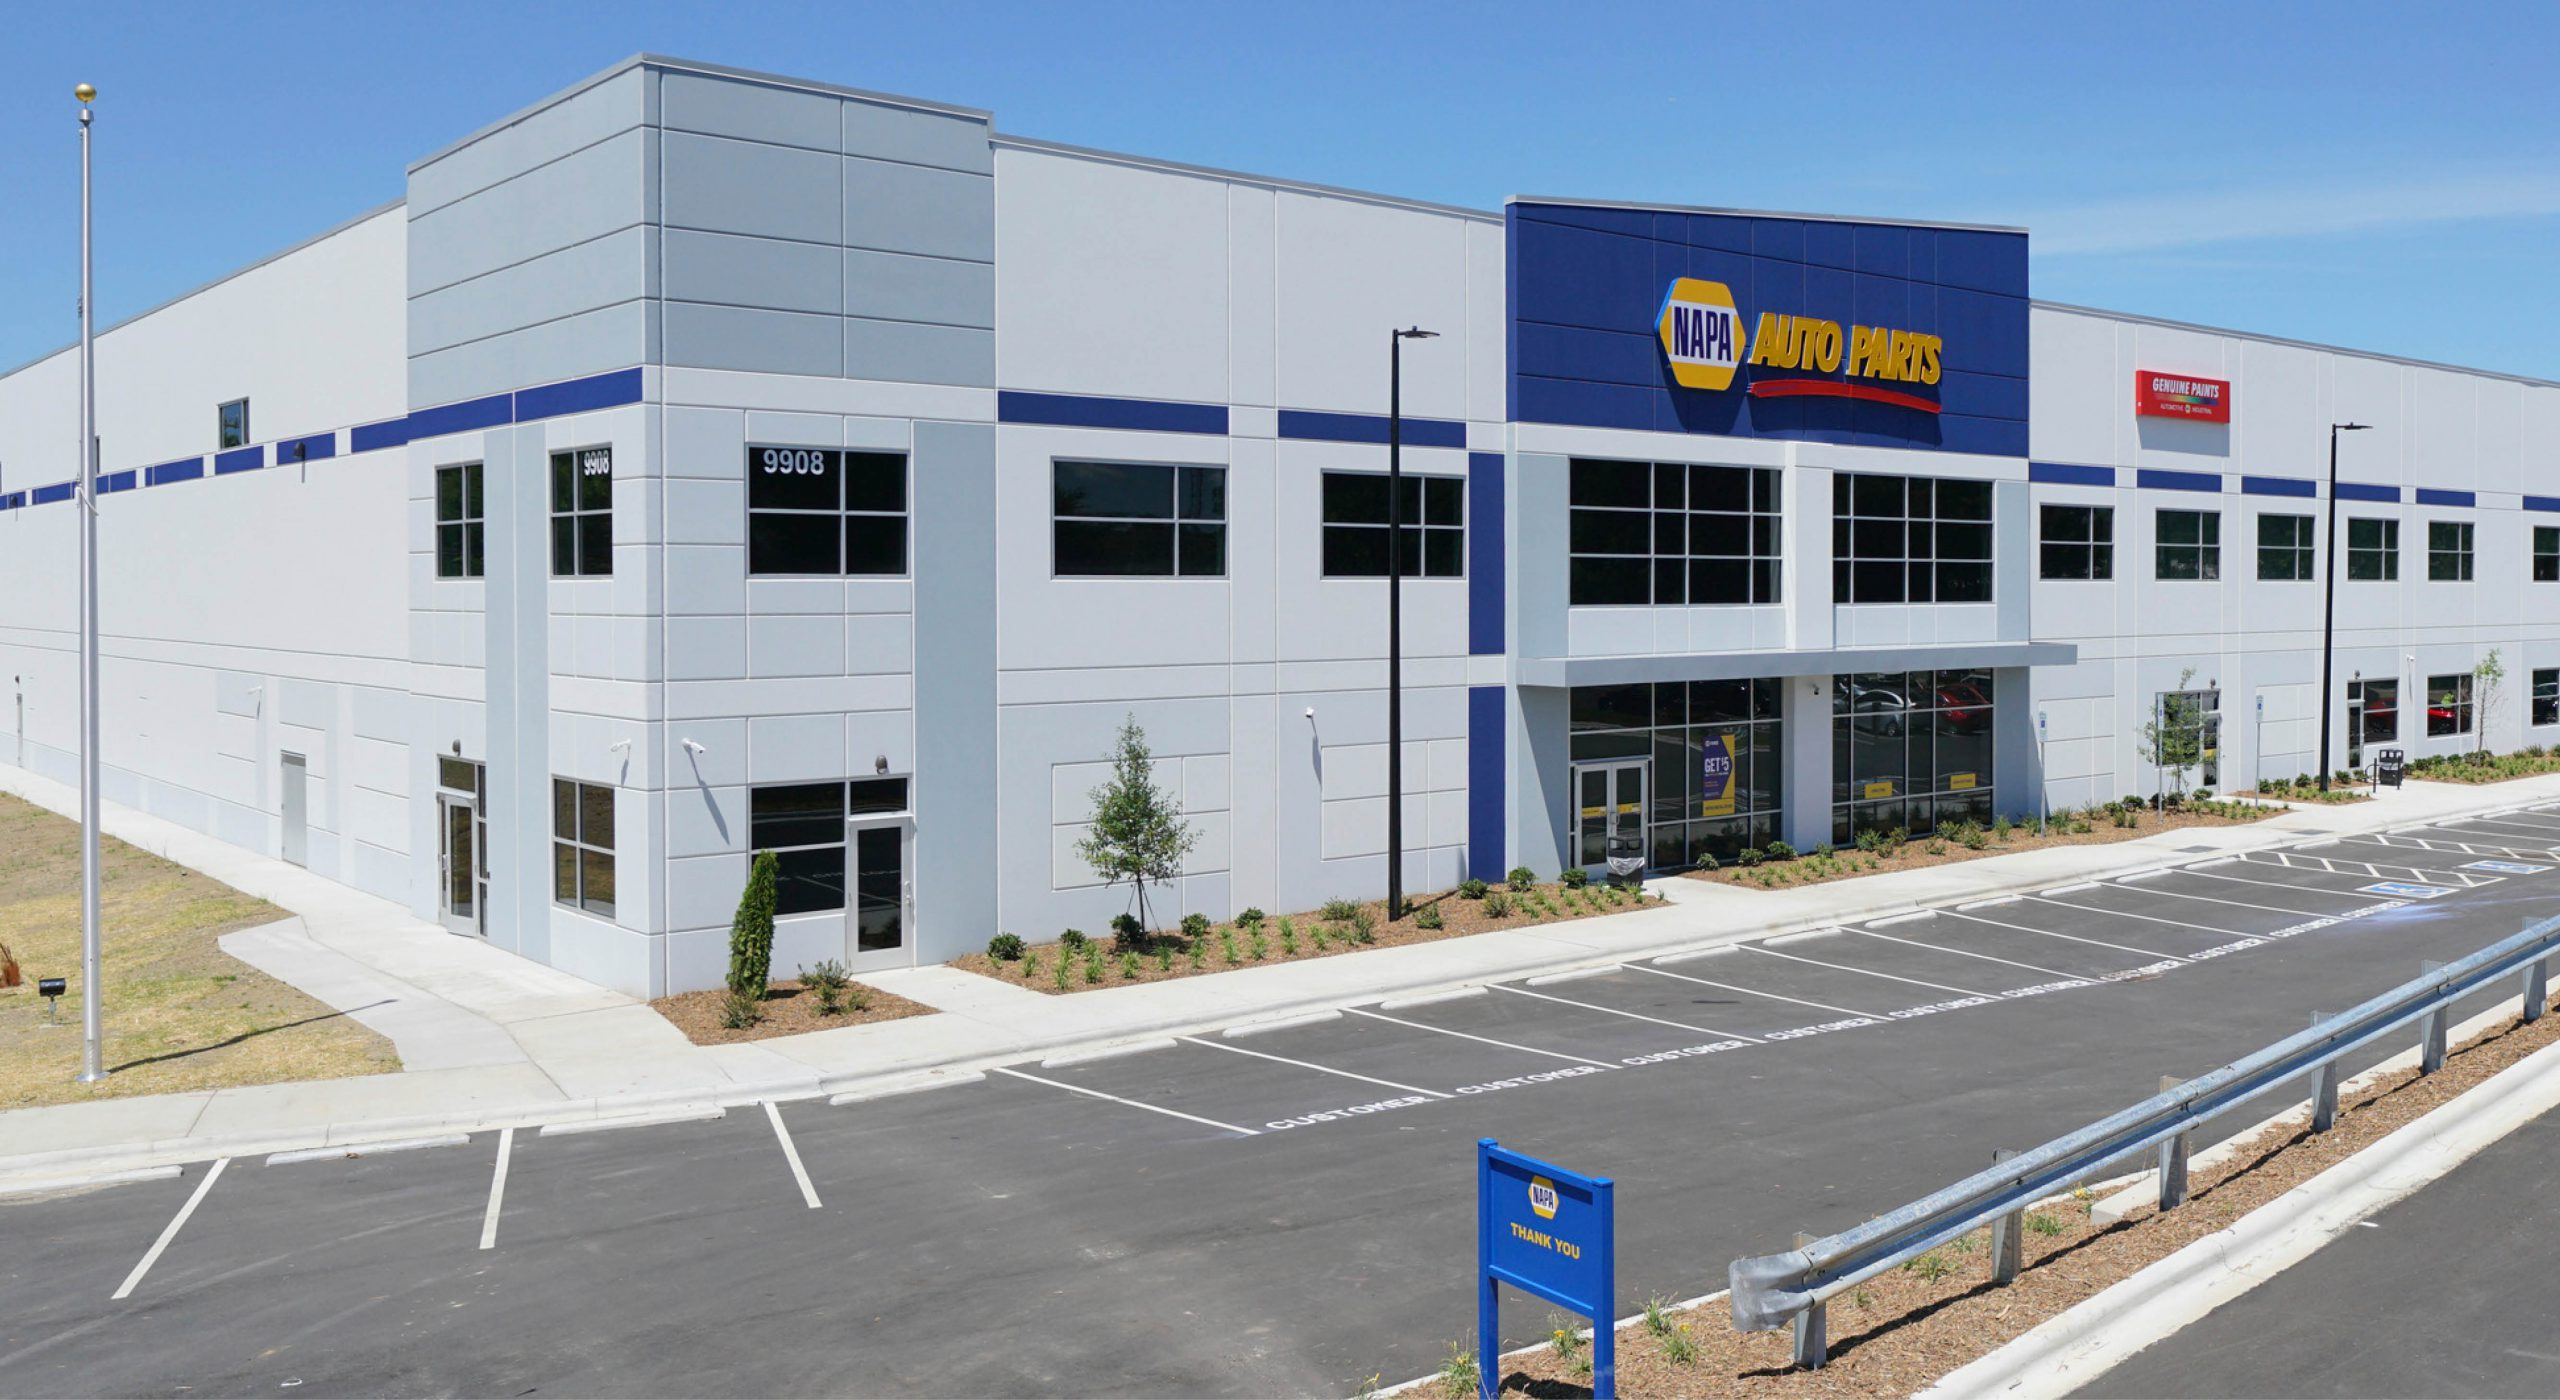 Napa Auto Parts industrial build to suit building